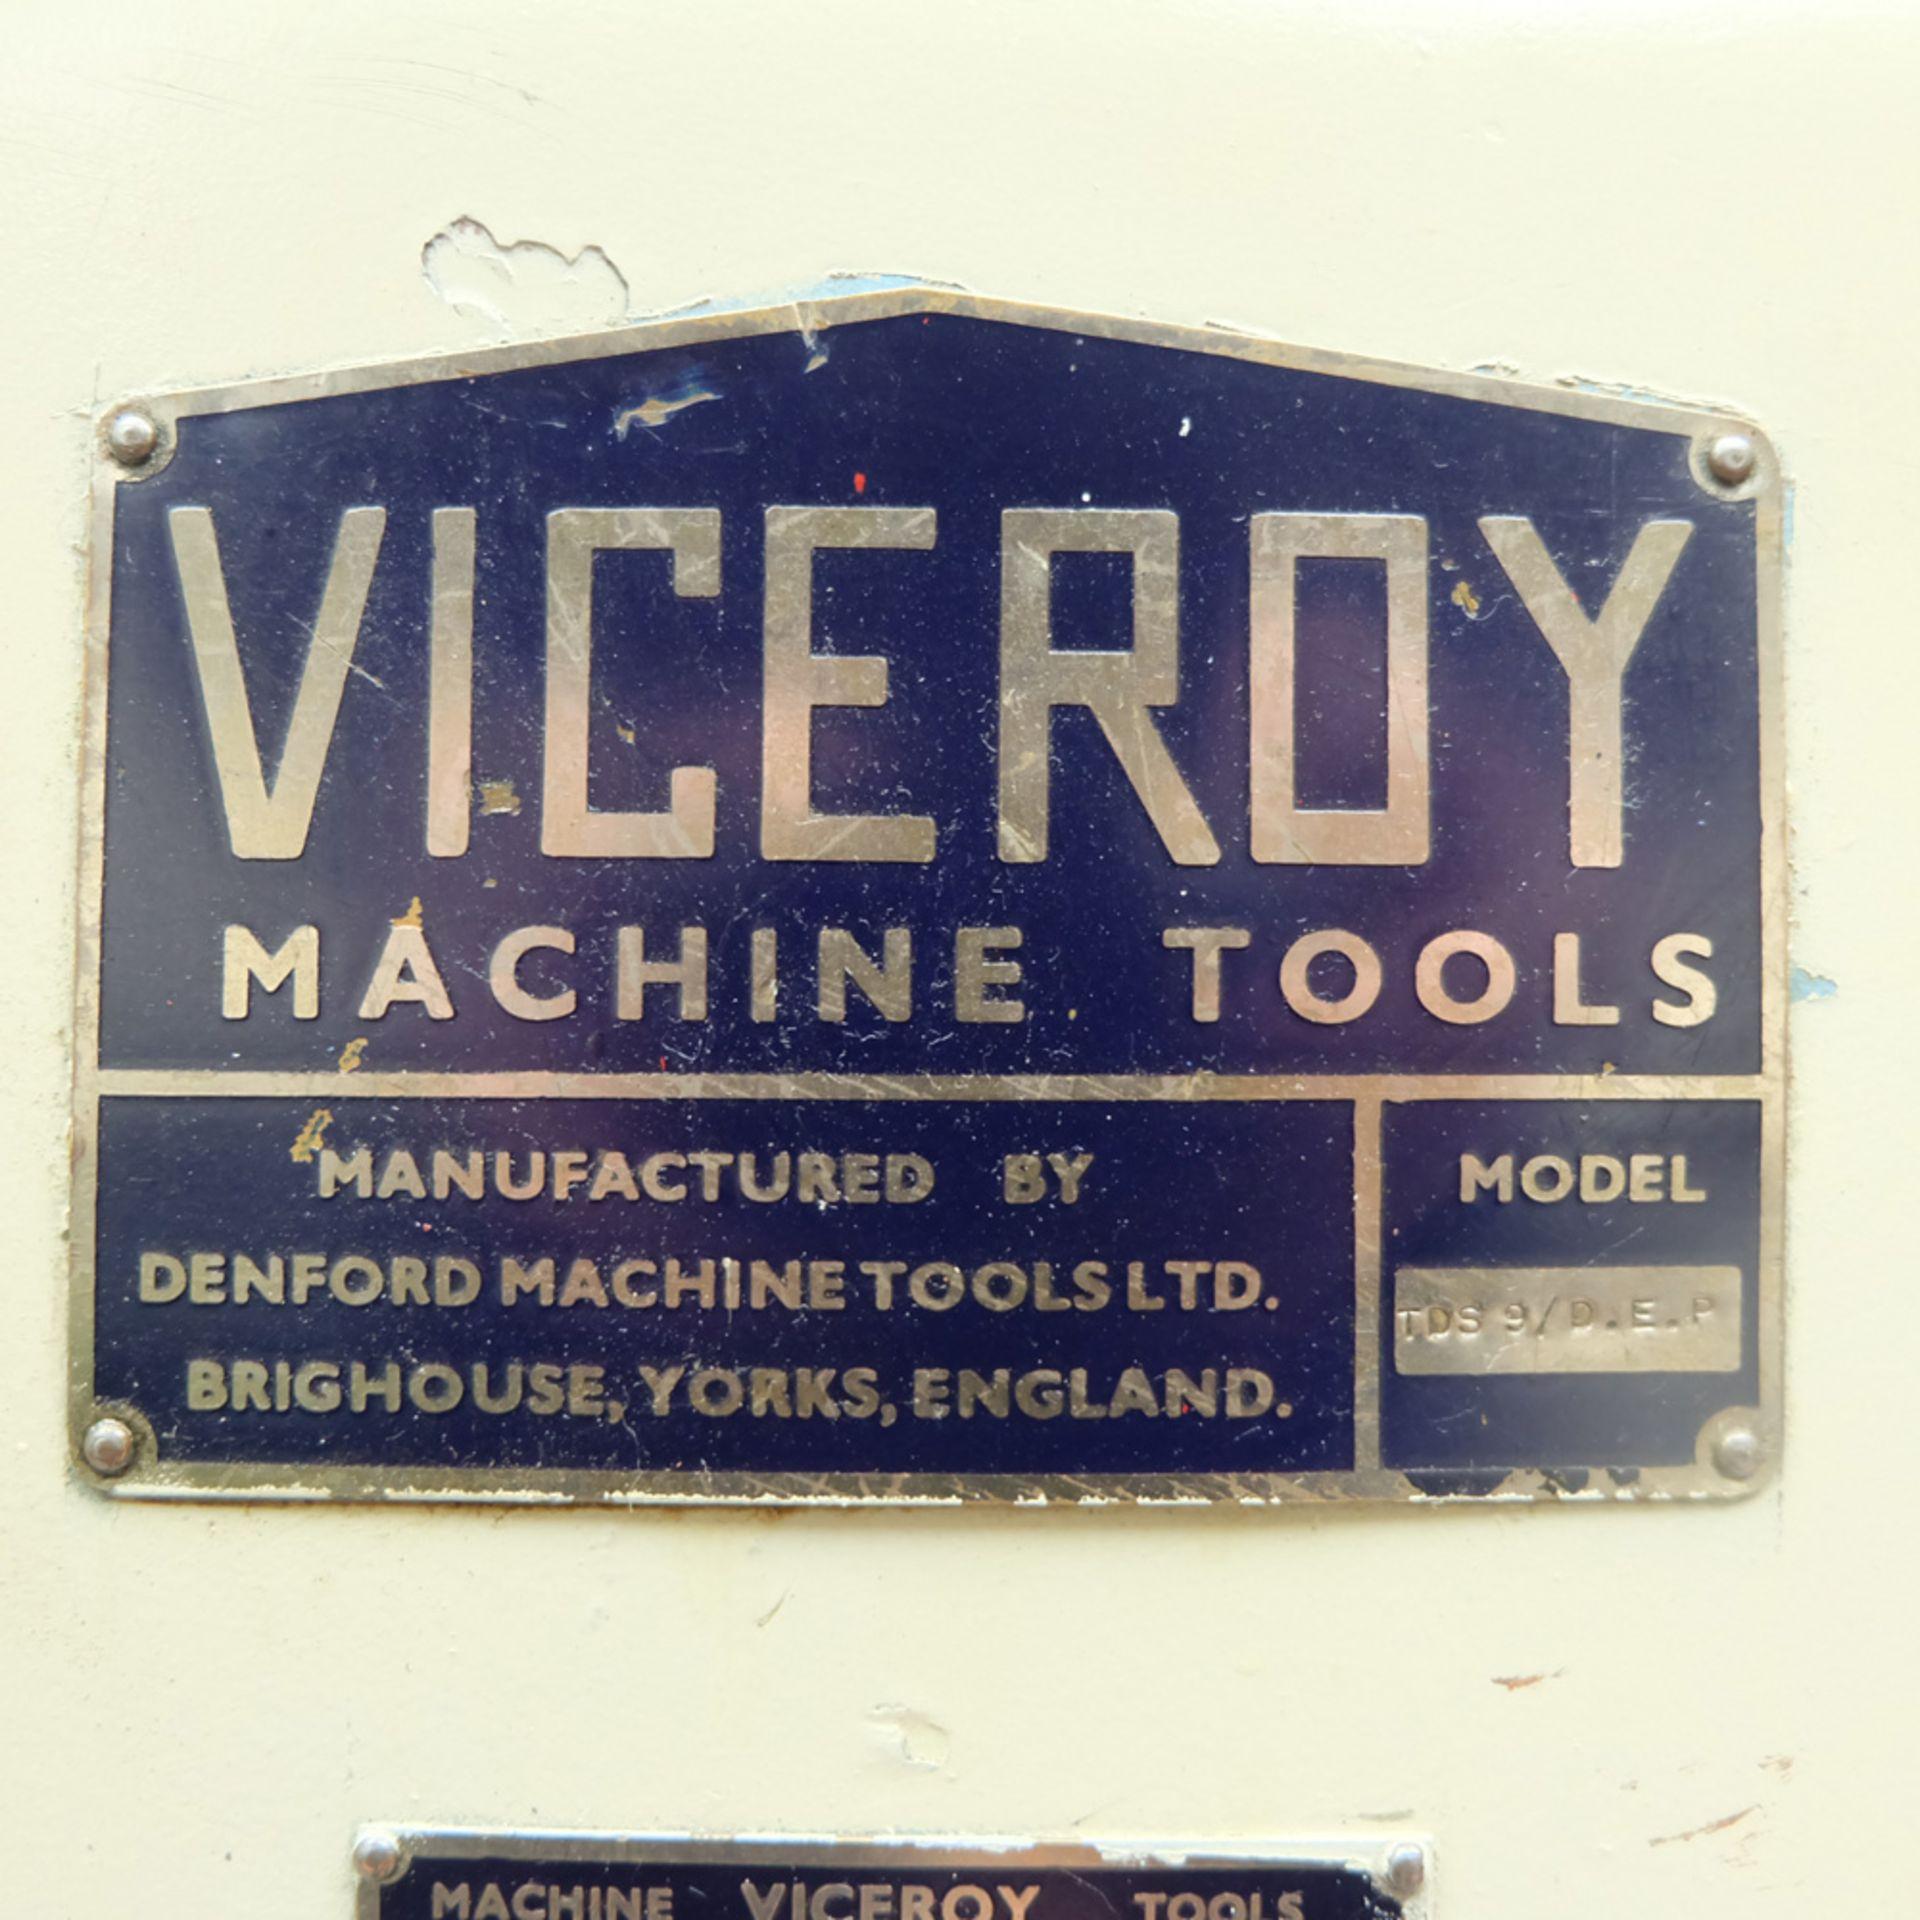 Viceroy Model TDS9 Double Ended Pedestal Polishing Machine. - Image 5 of 6